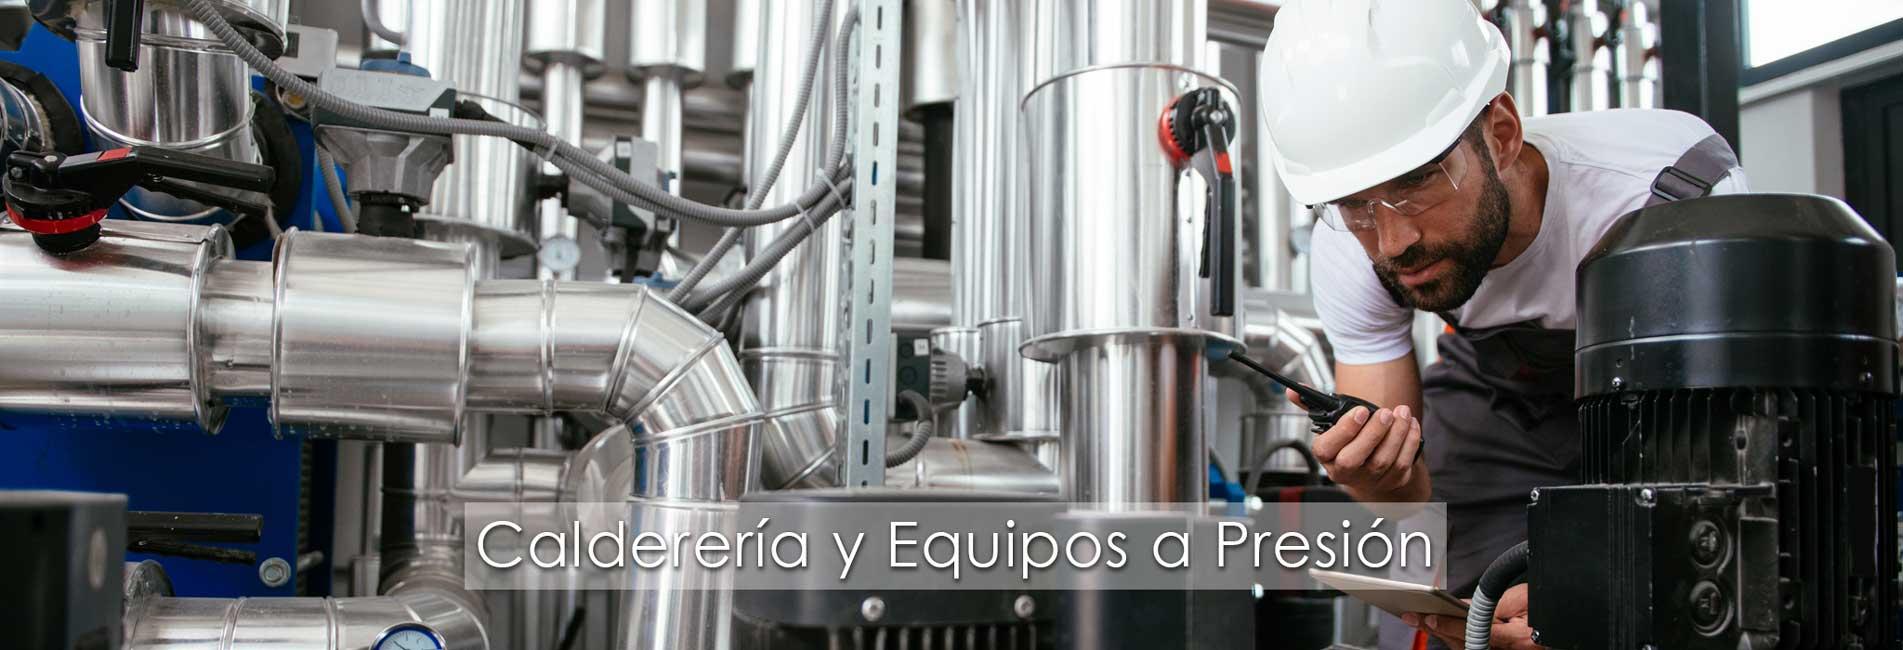 ERP Calderería y Equipos a Presión